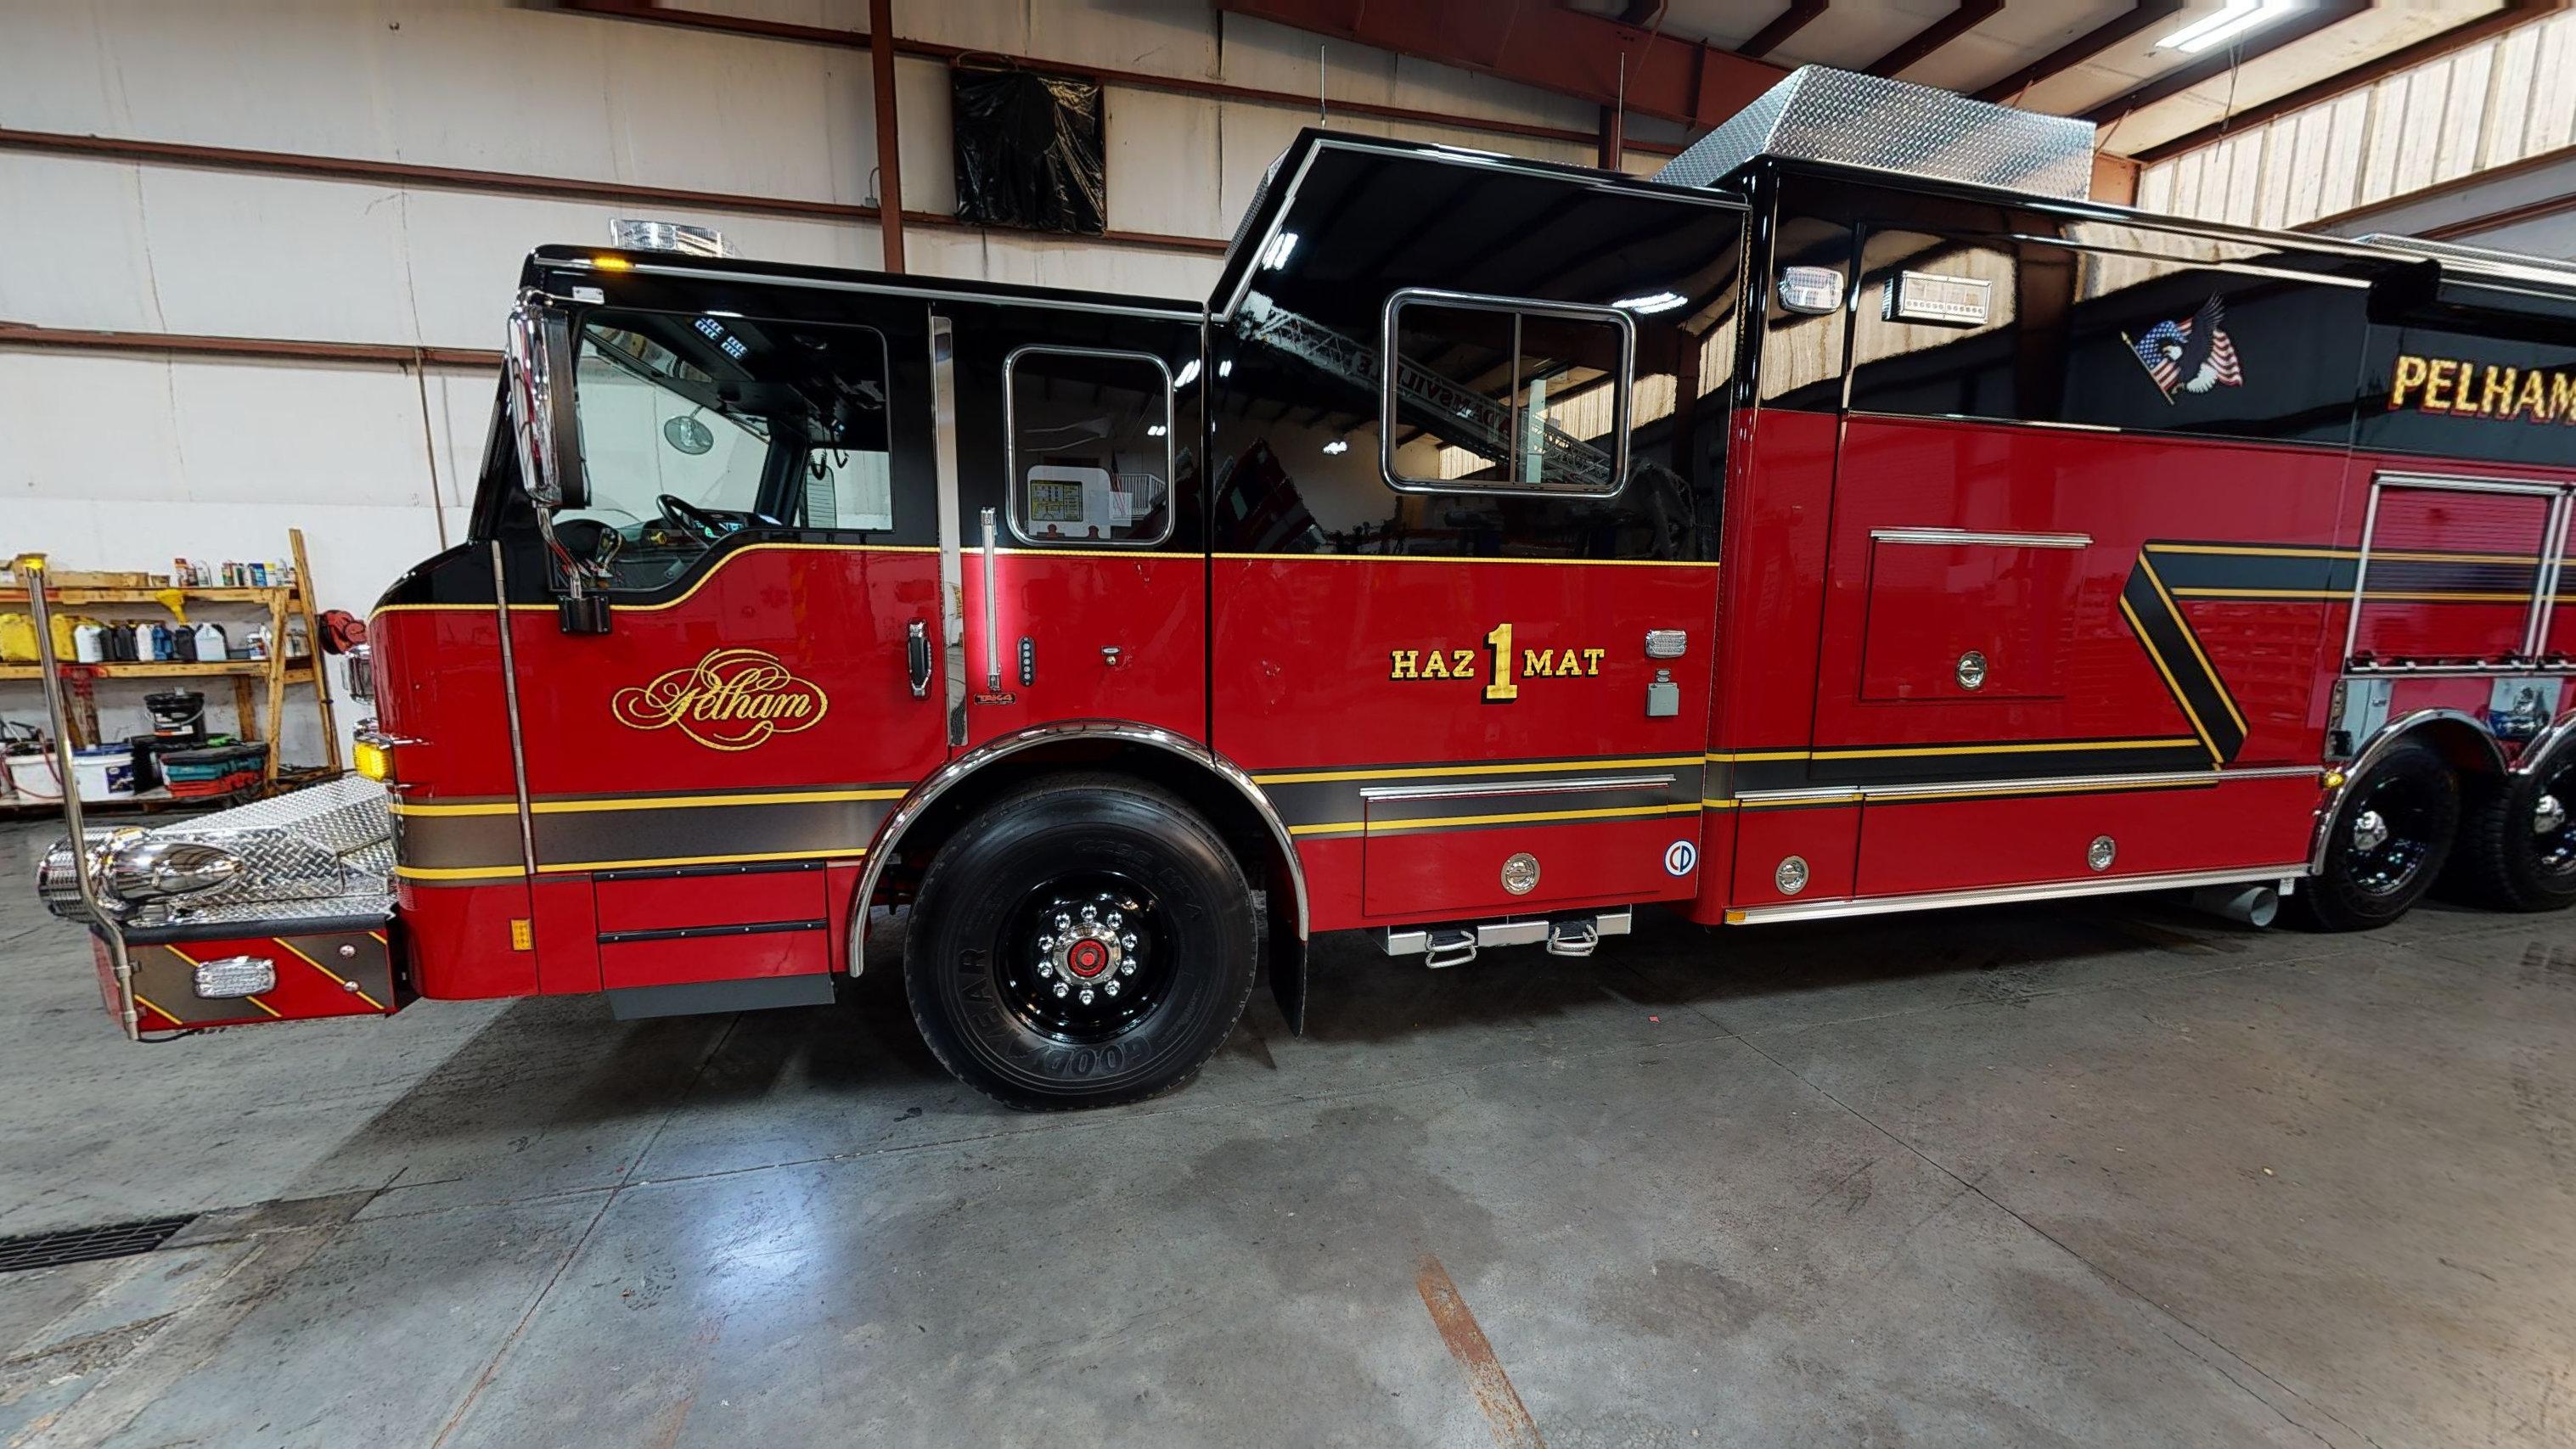 2_Pelham-Fire-Department-2019-Pierce-Velocity-HazmatCommand-Job-33168-12092020_072213